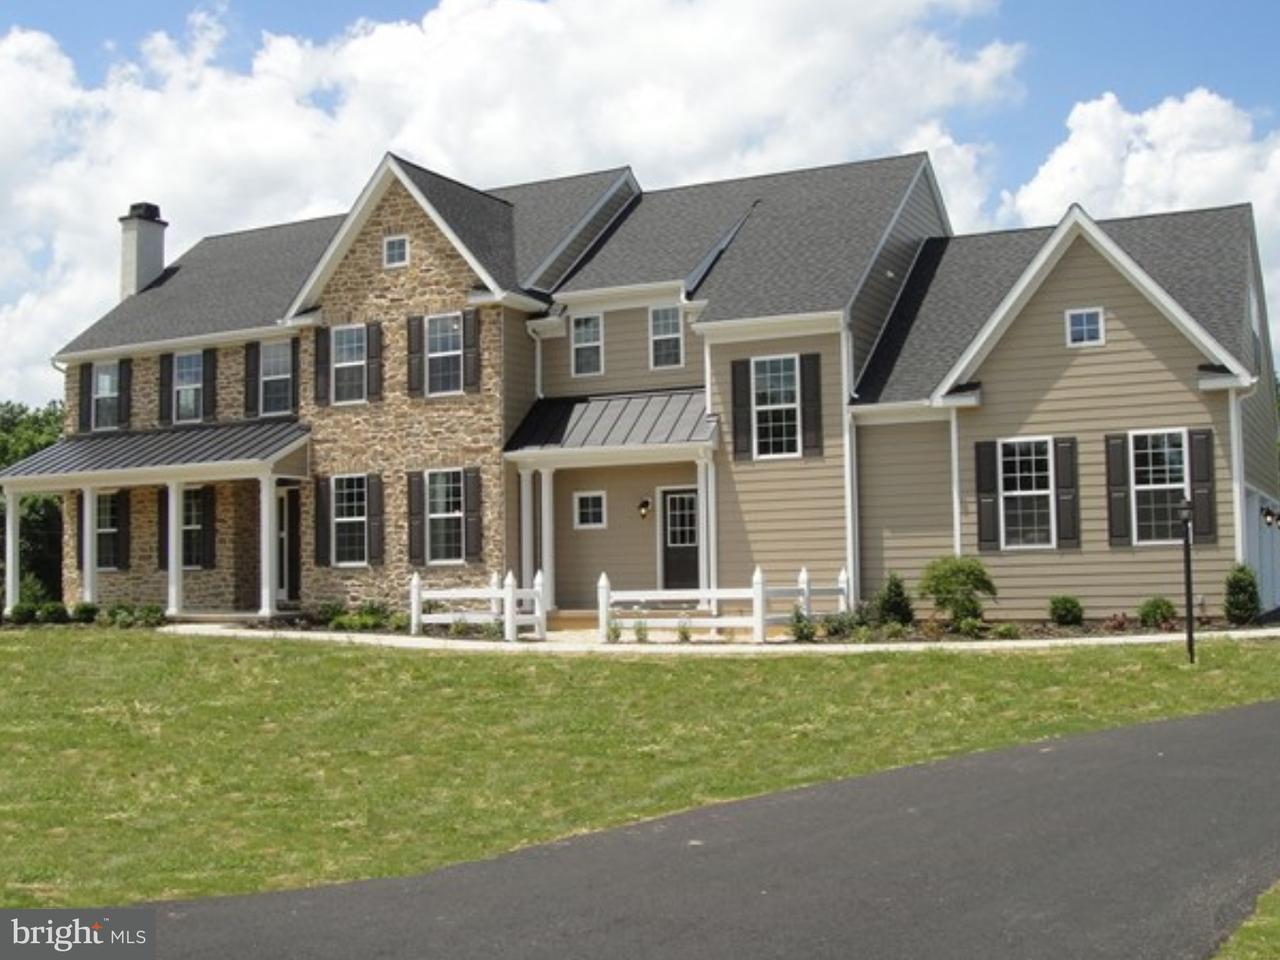 Single Family Home for Sale at Lot 5 ROSE Lane Horsham, Pennsylvania 19044 United States